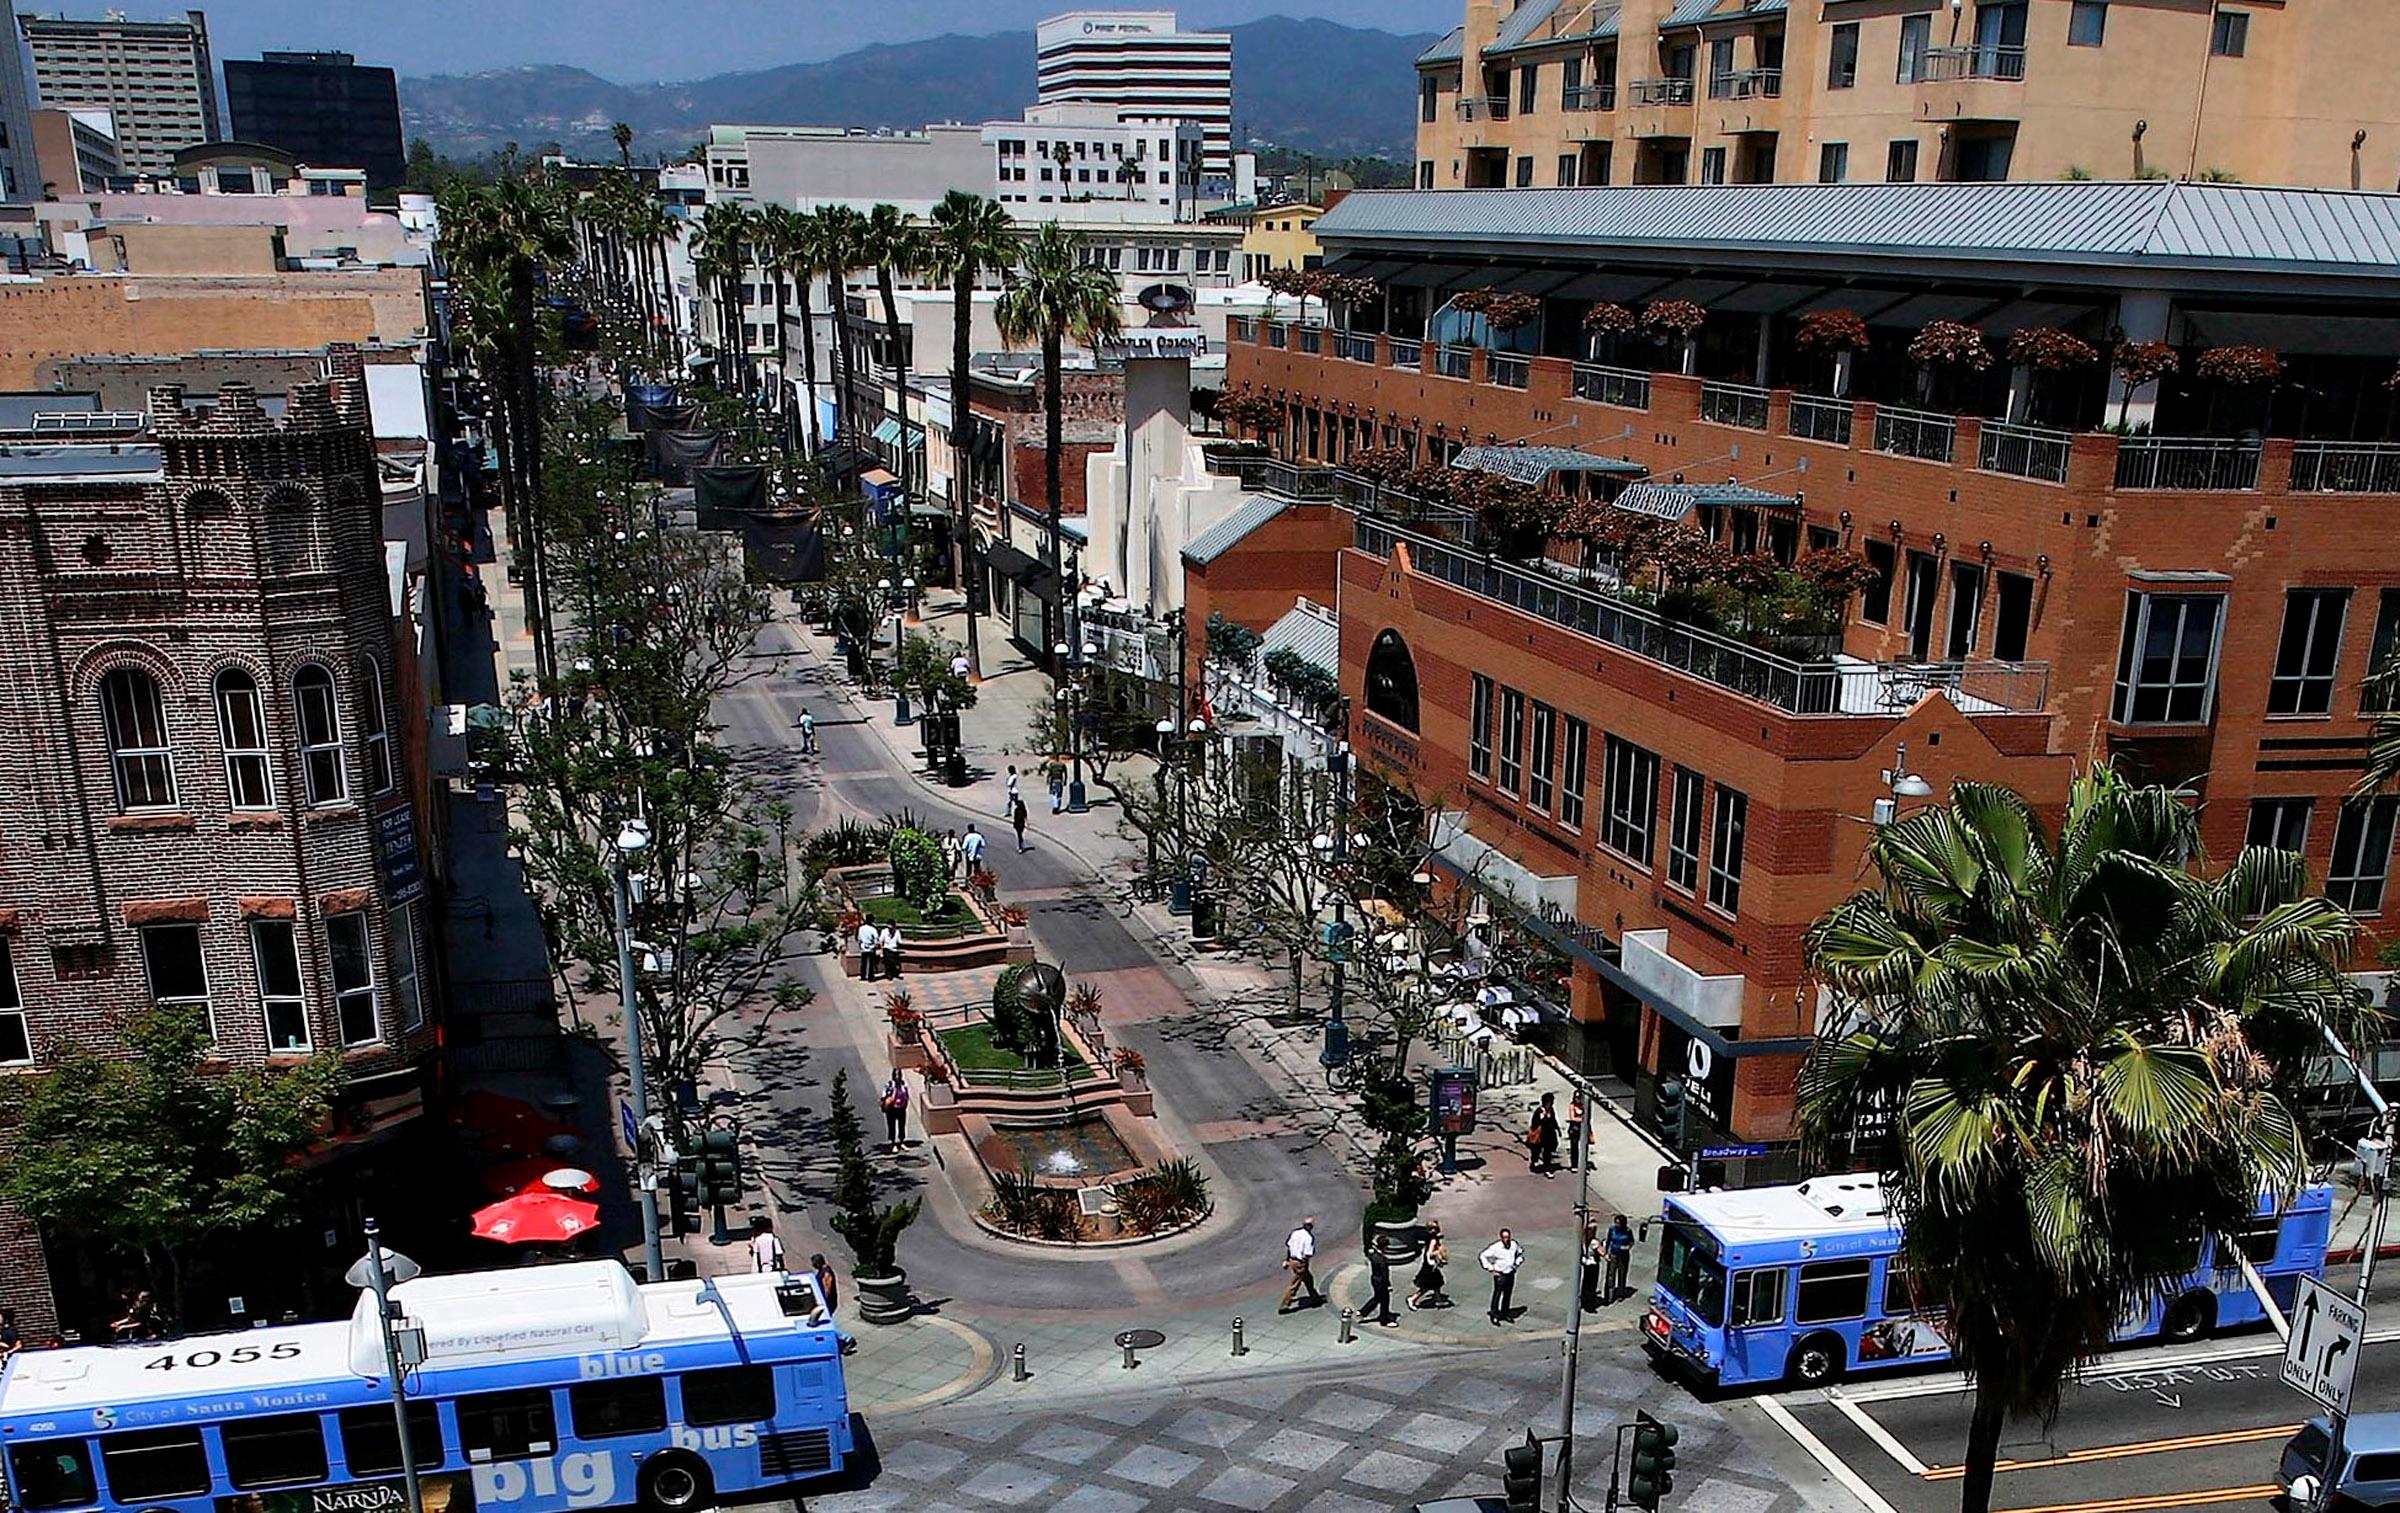 Stop #4 - 3rd Street Promenade. This downtown Santa Monica ...